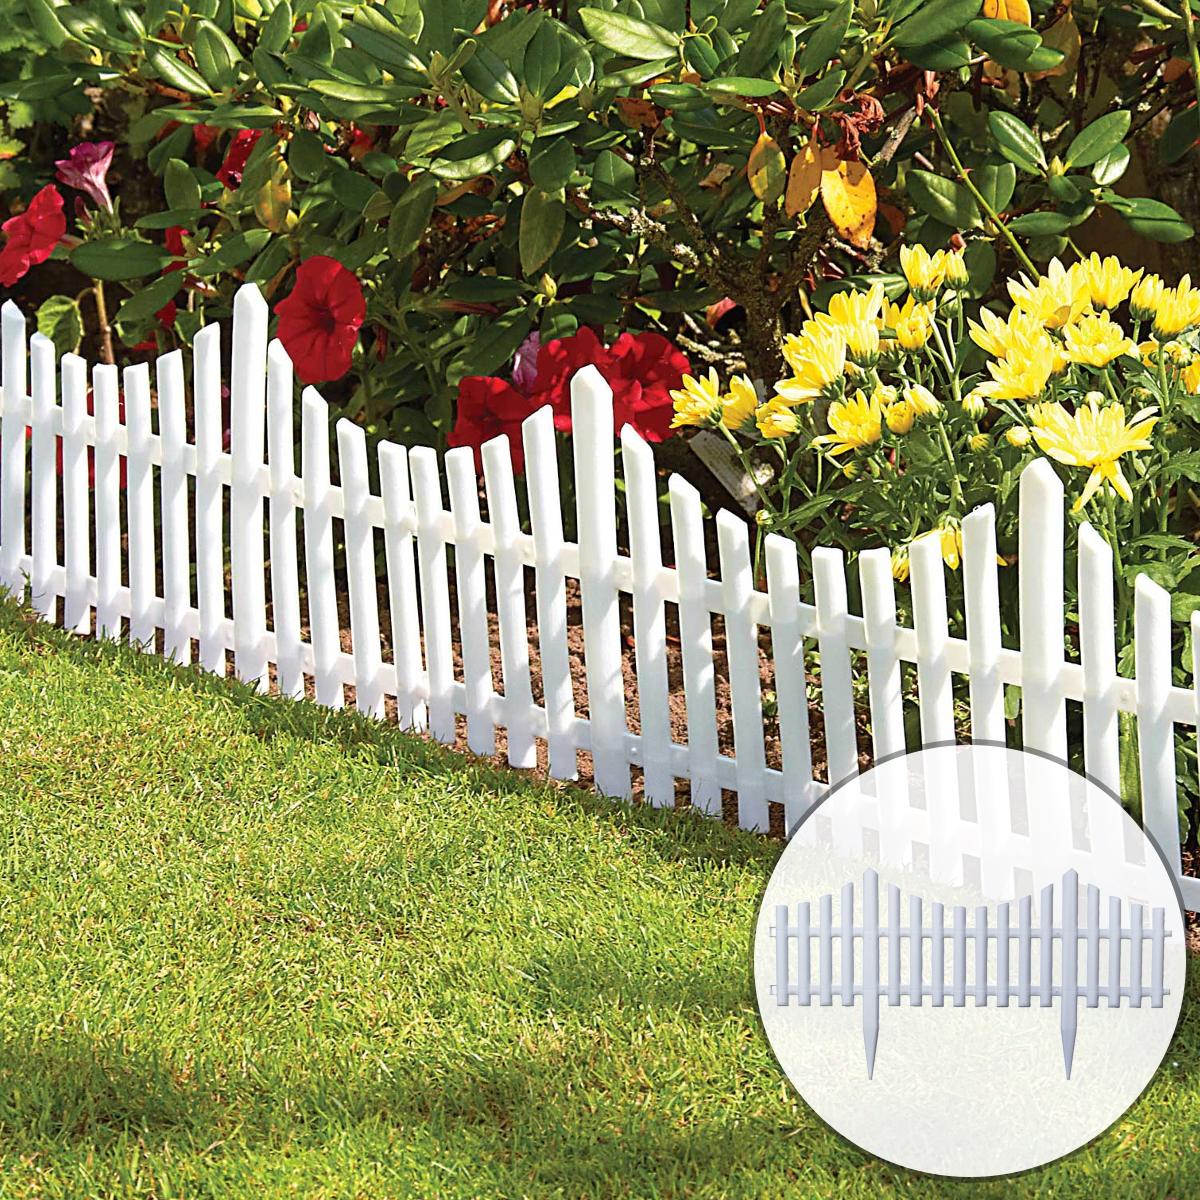 Kct White Picket Fence Garden Border Pack Of 8 Panels